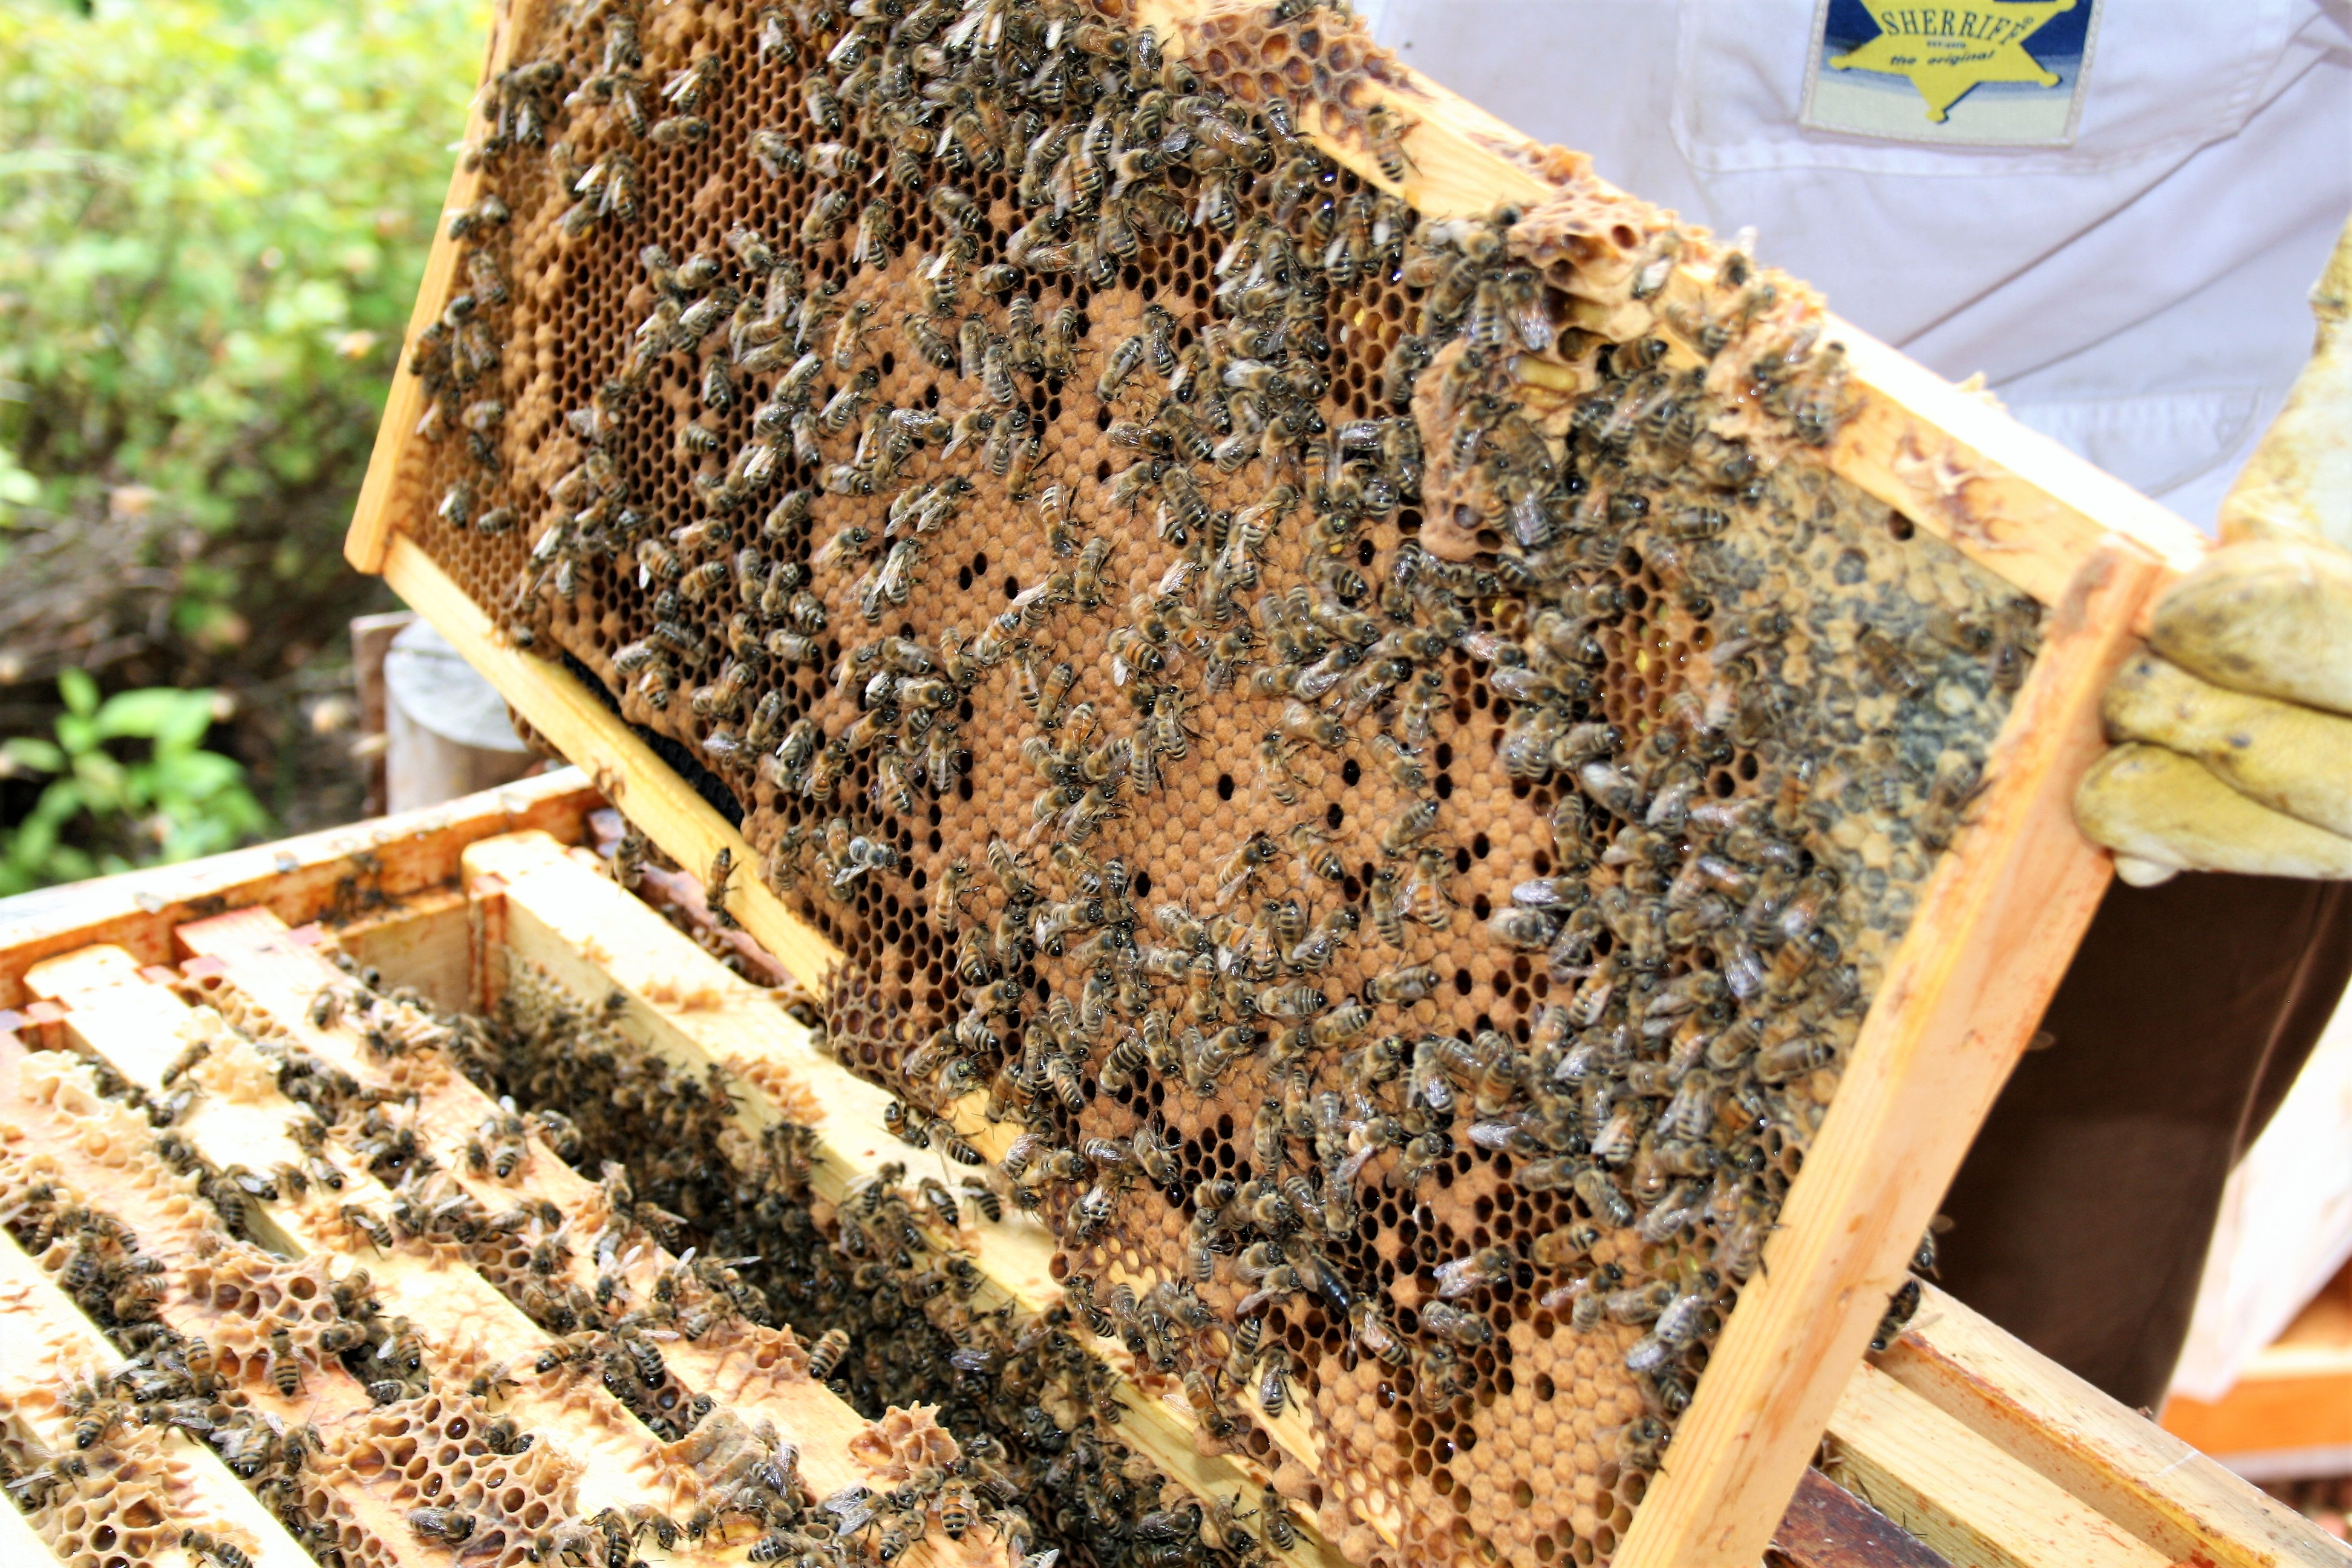 The Bee Hives at Fairmont Hotel Macdonald